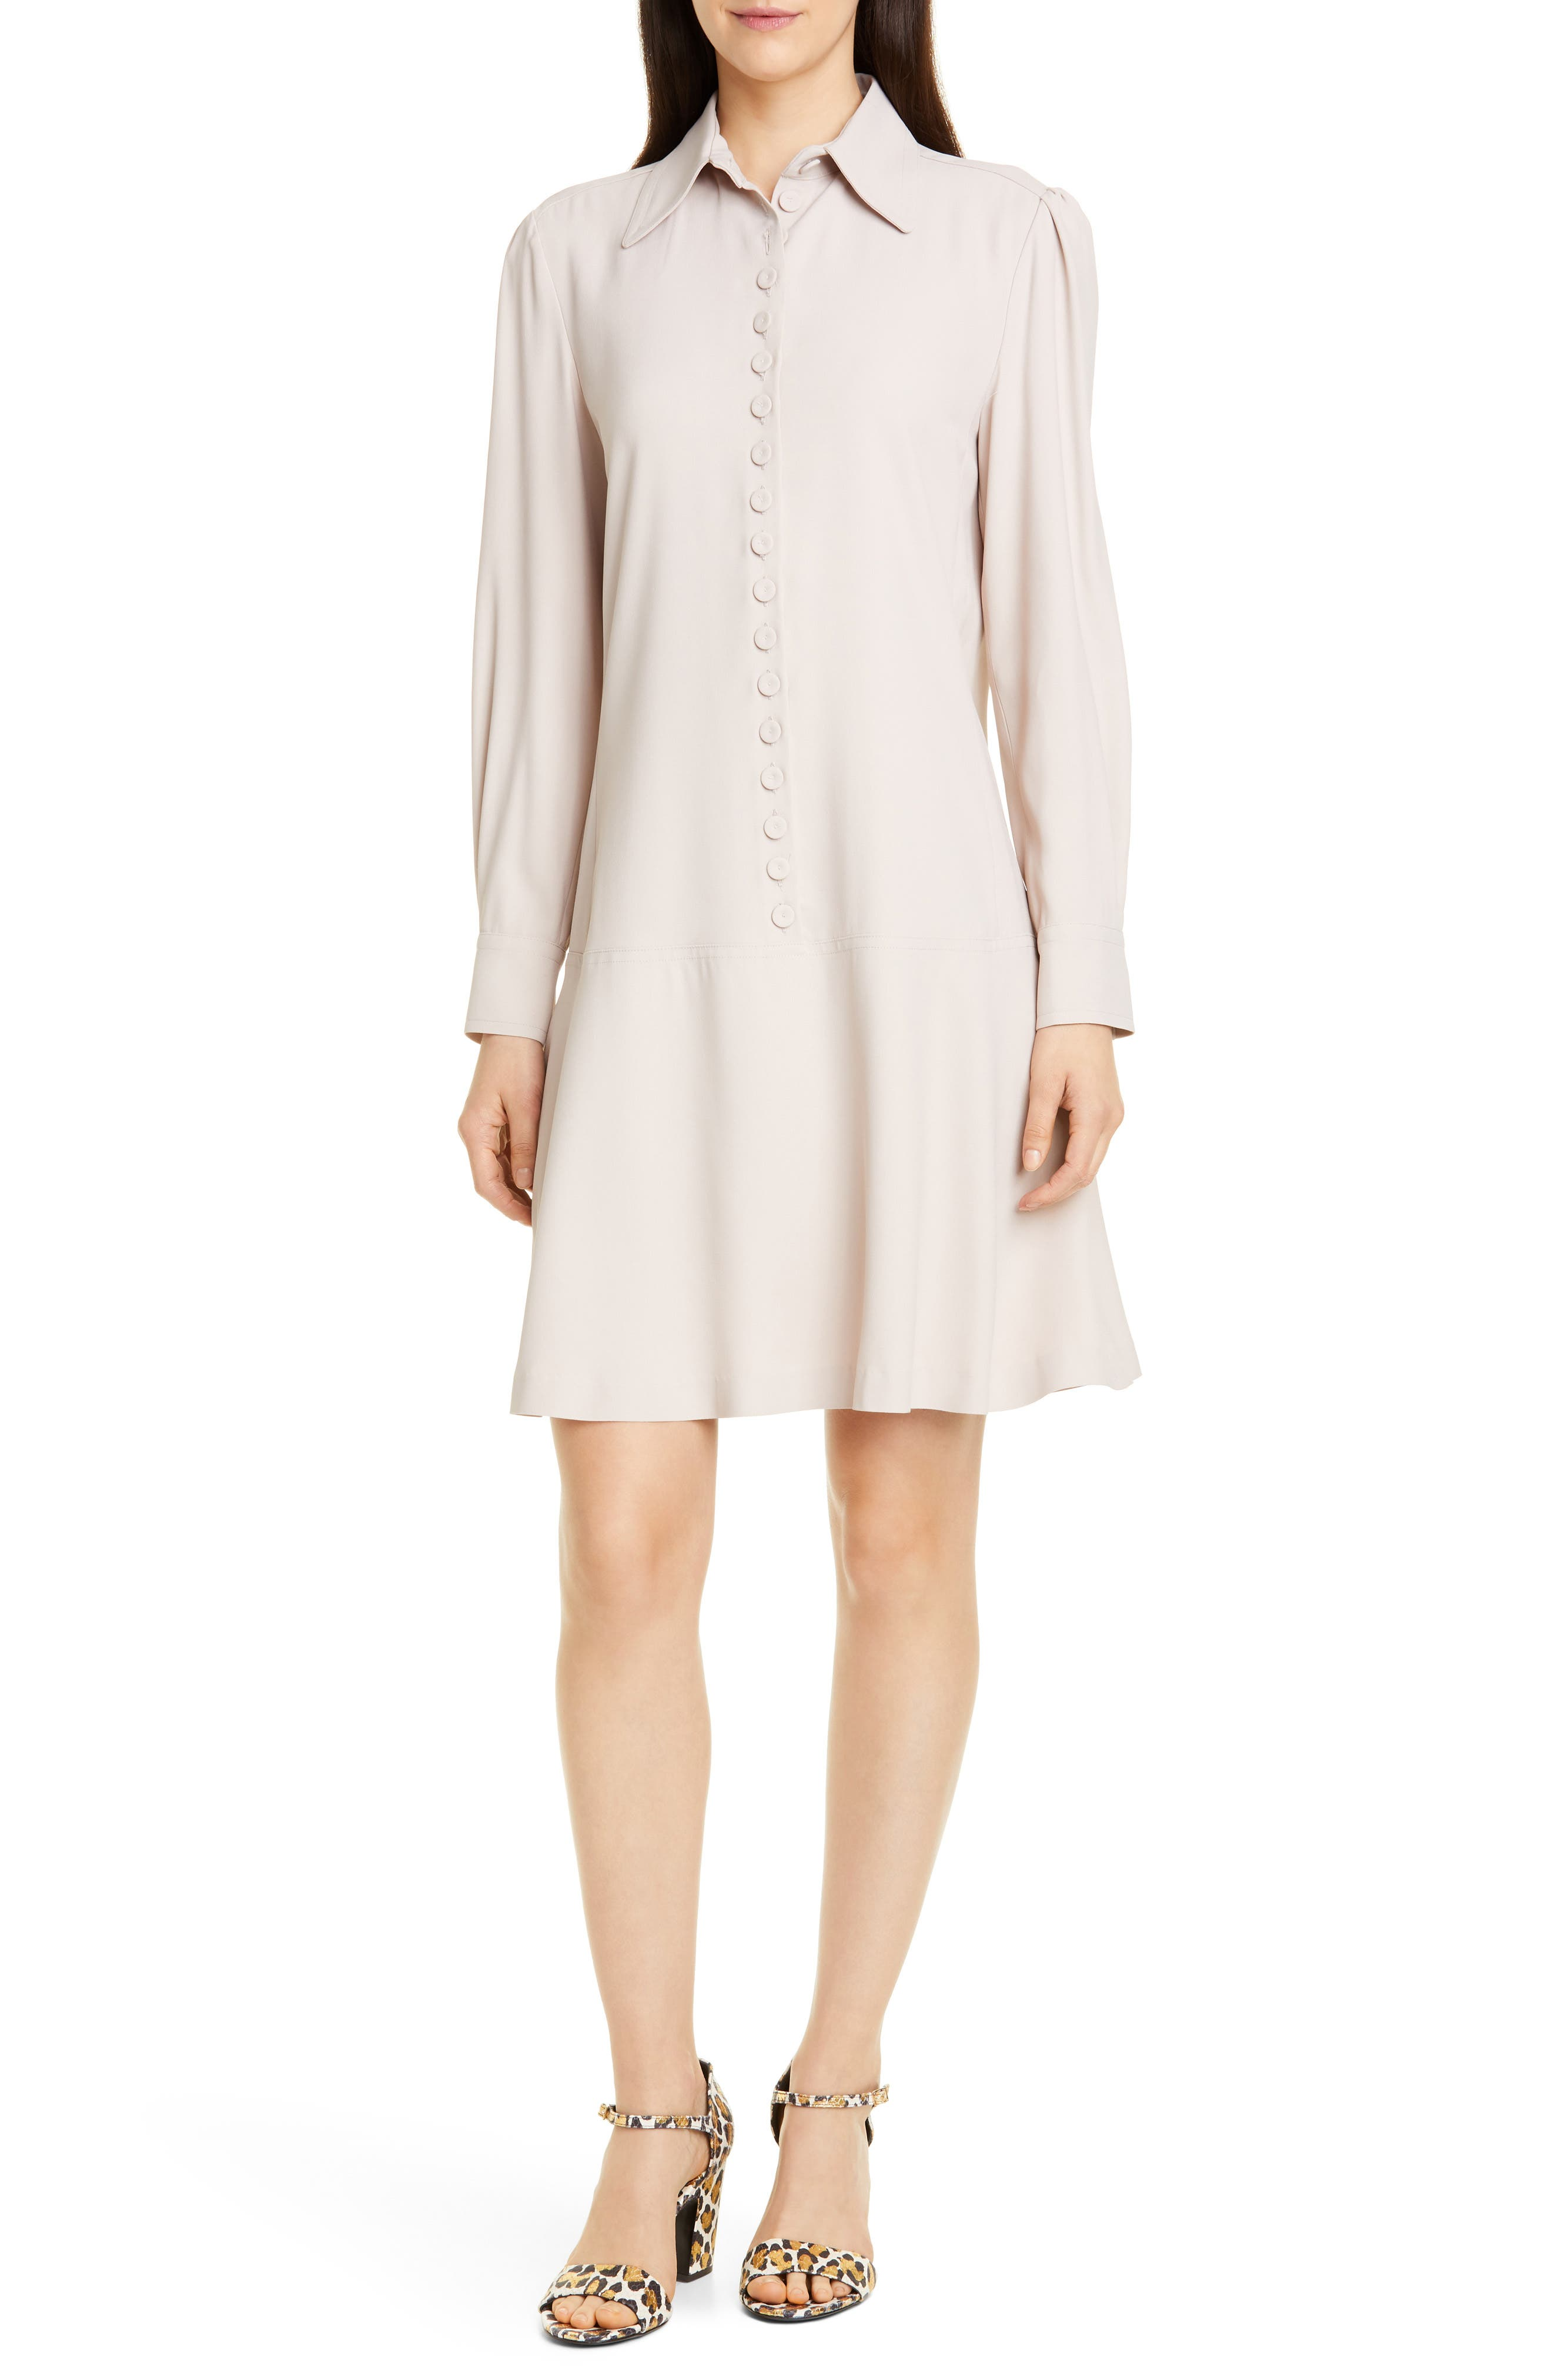 60s Wedding Dresses | 70s Wedding Dresses Womens Seventy Drop Waist Shirtdress $425.00 AT vintagedancer.com